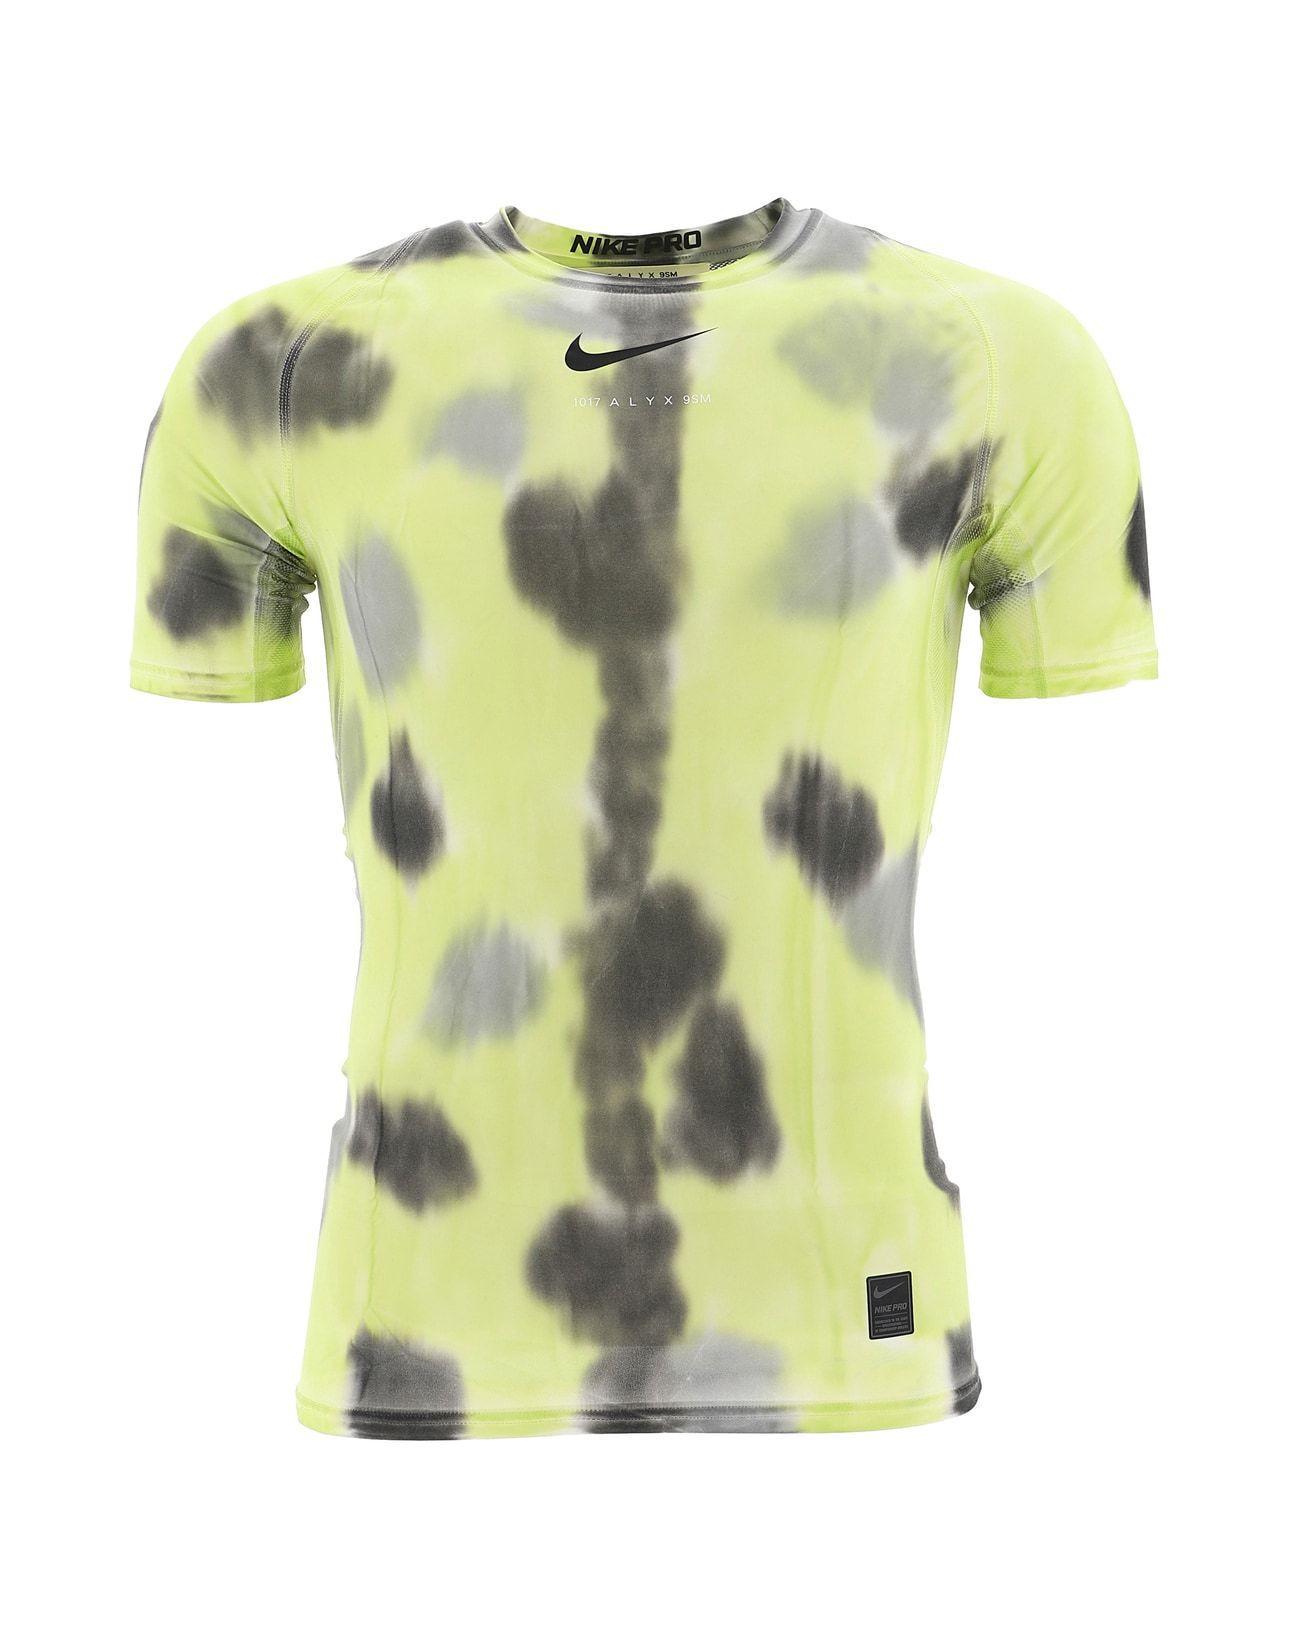 9c34bf74087 1017 ALYX 9SM X Nike Sponge Print T-shirt in Yellow - Lyst